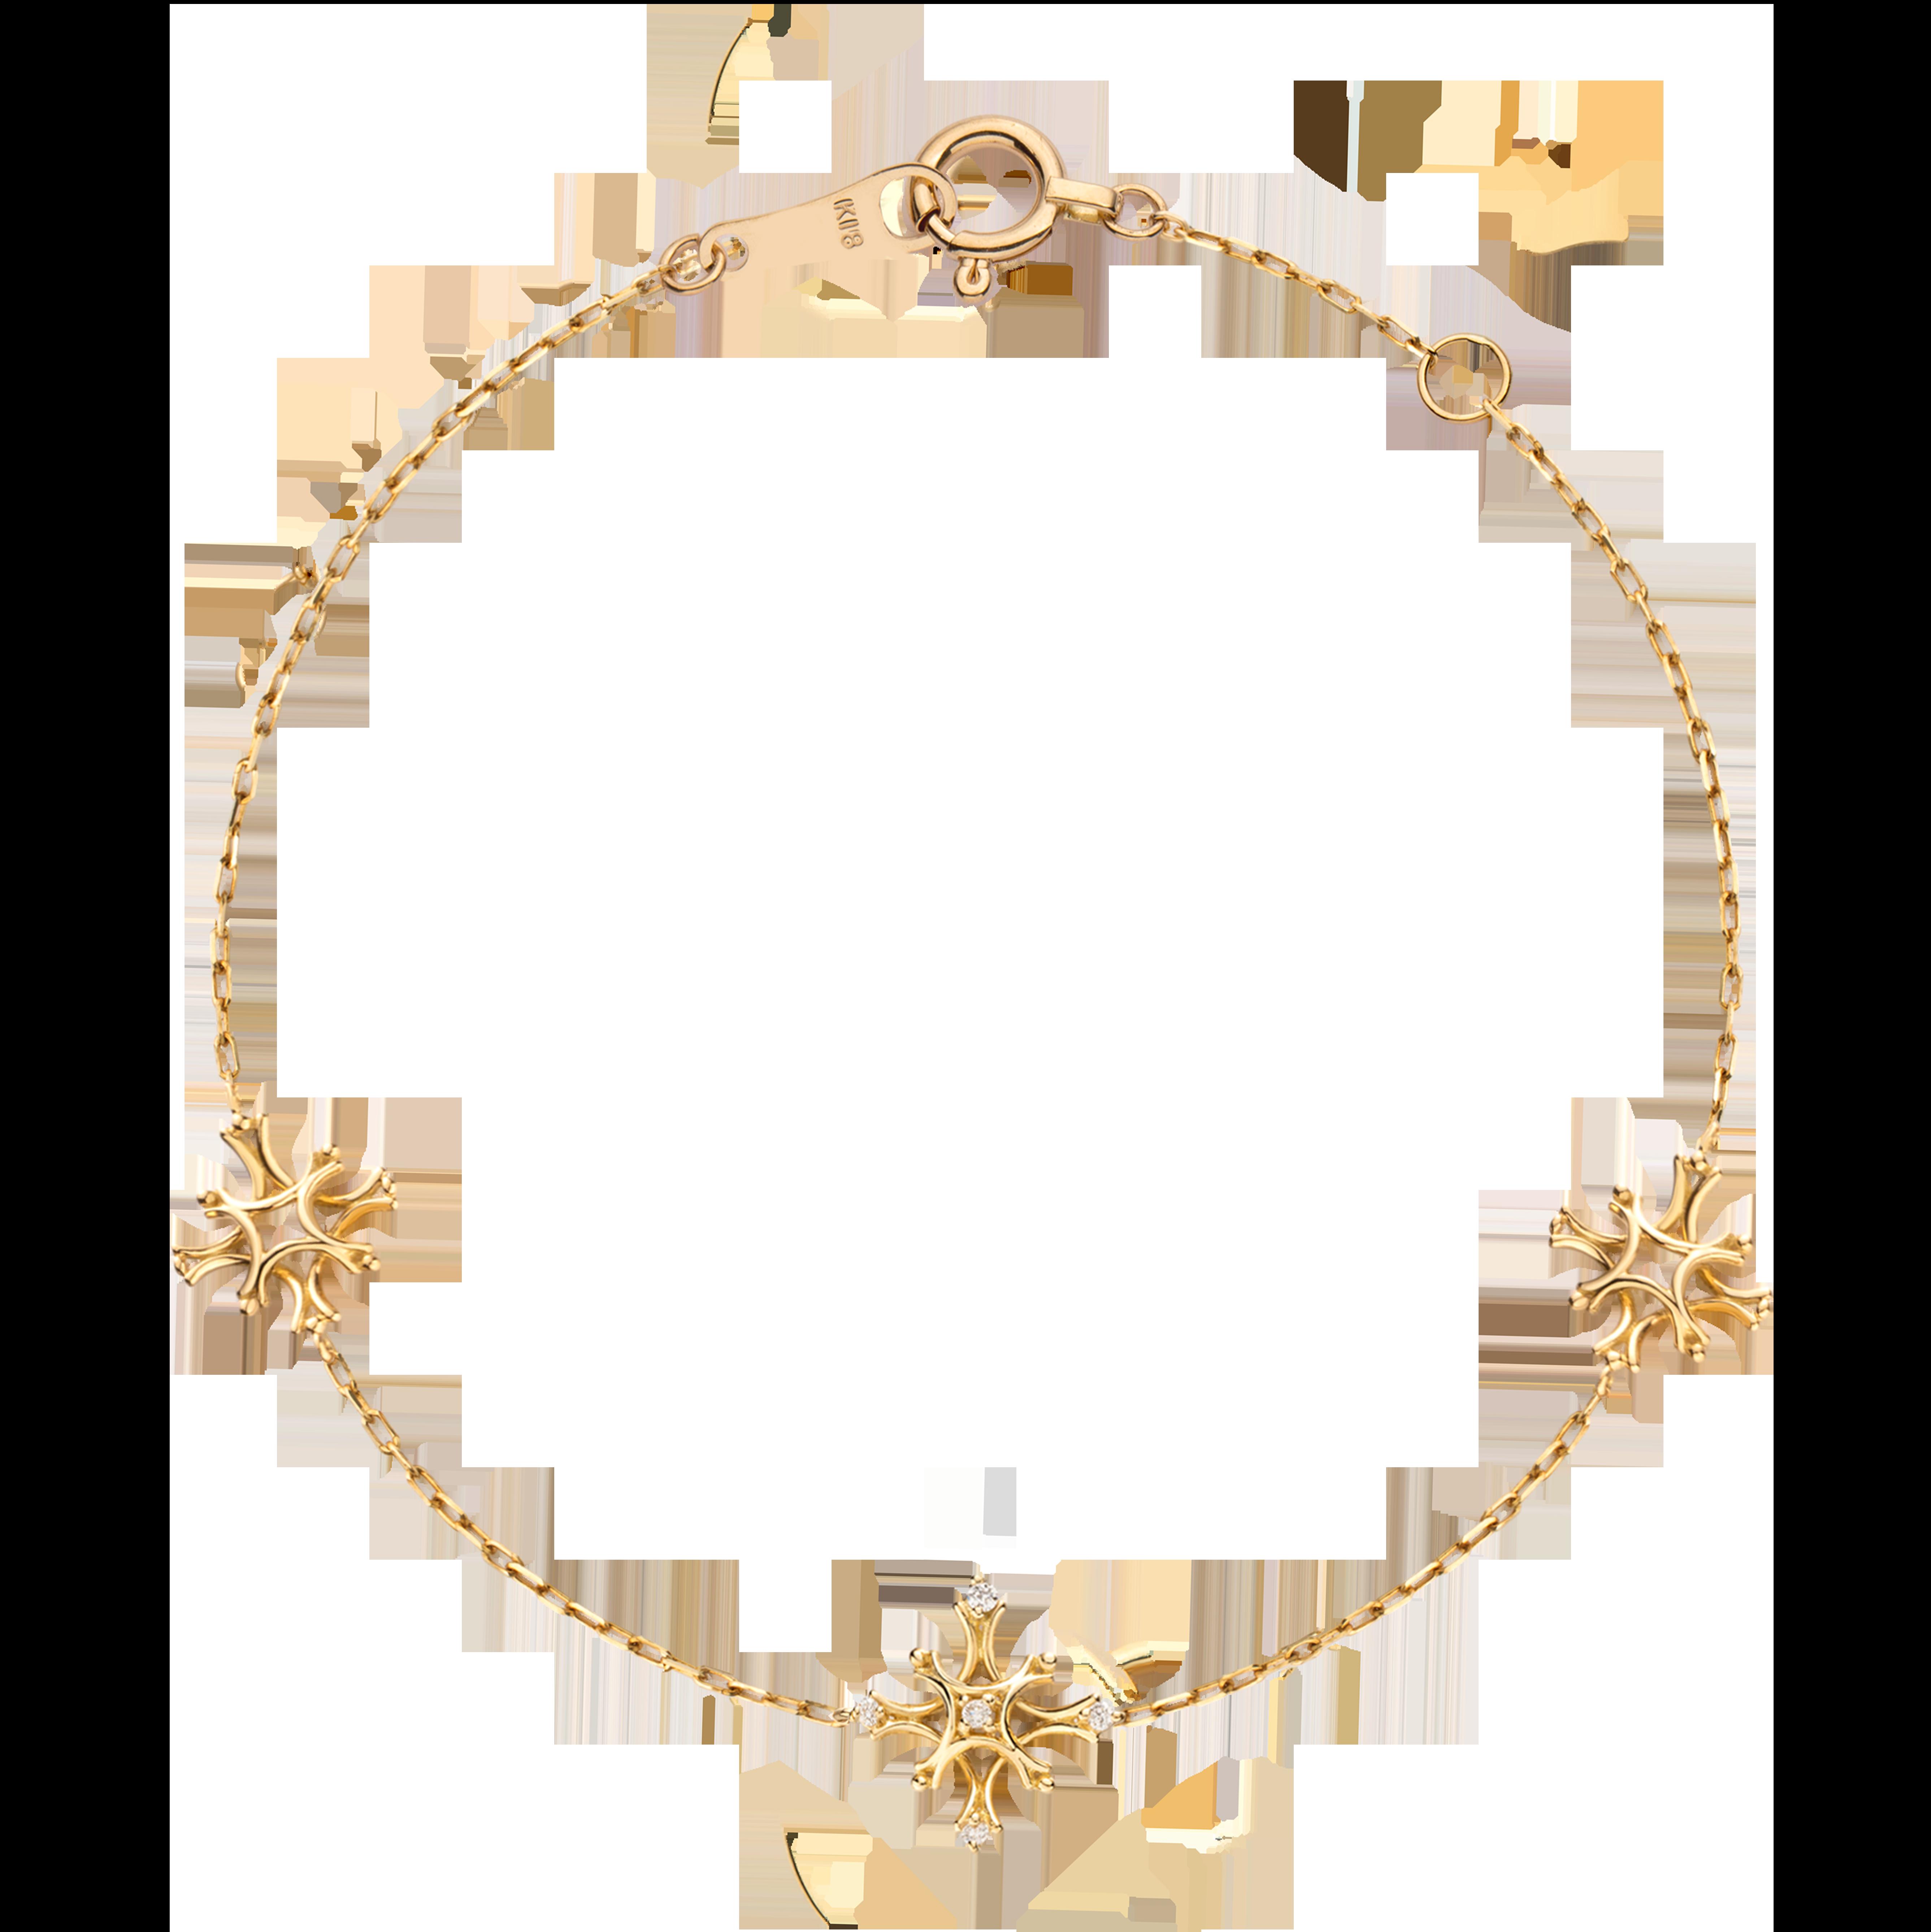 Flocon Collection 18K黄金 钻石雪花手链 4399